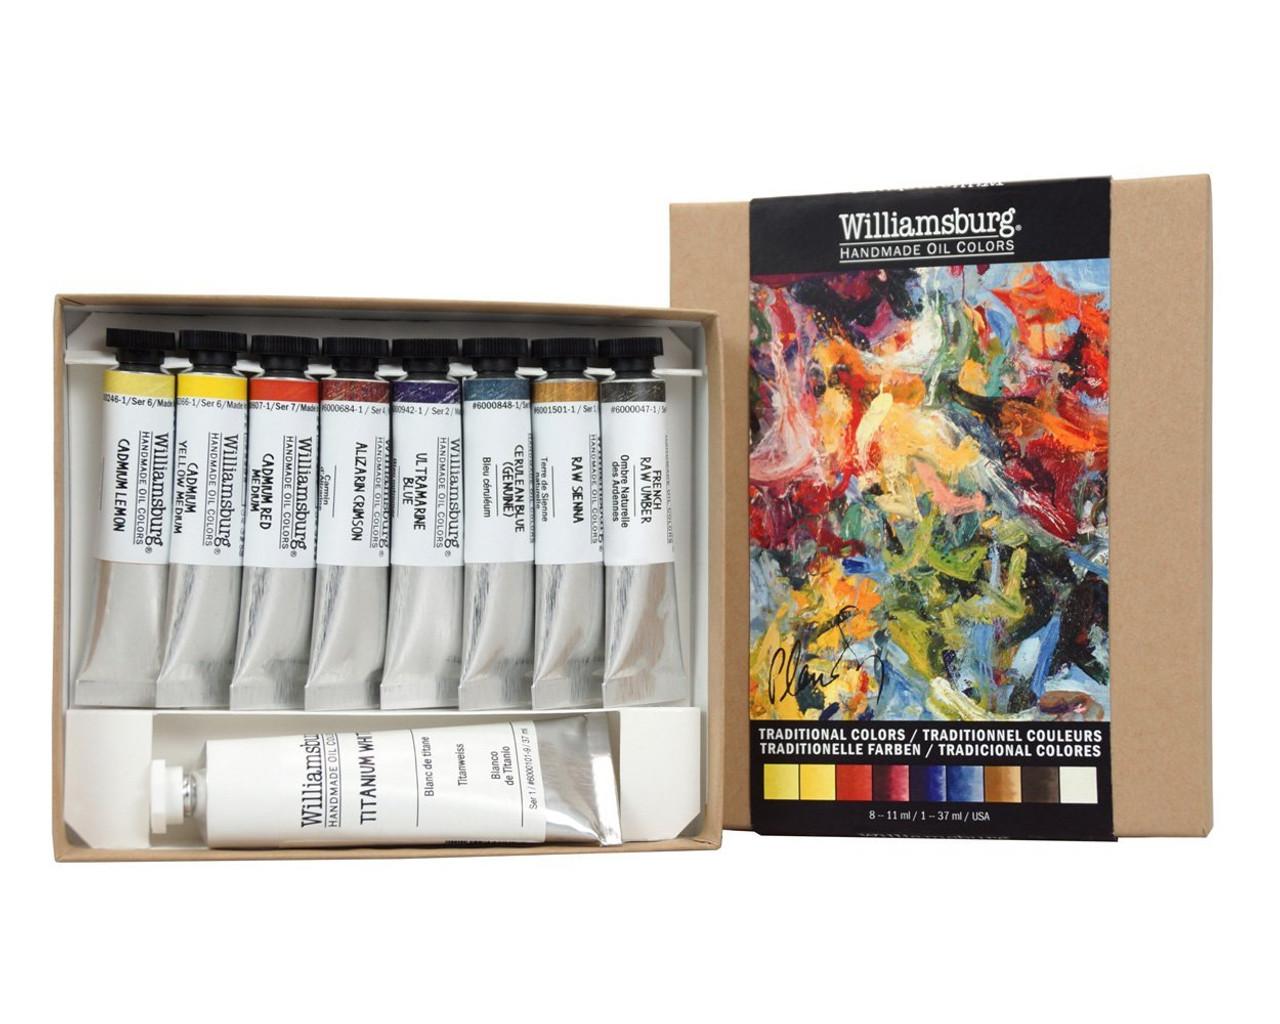 Williamsburg Handmade Oil Color Set - Traditional